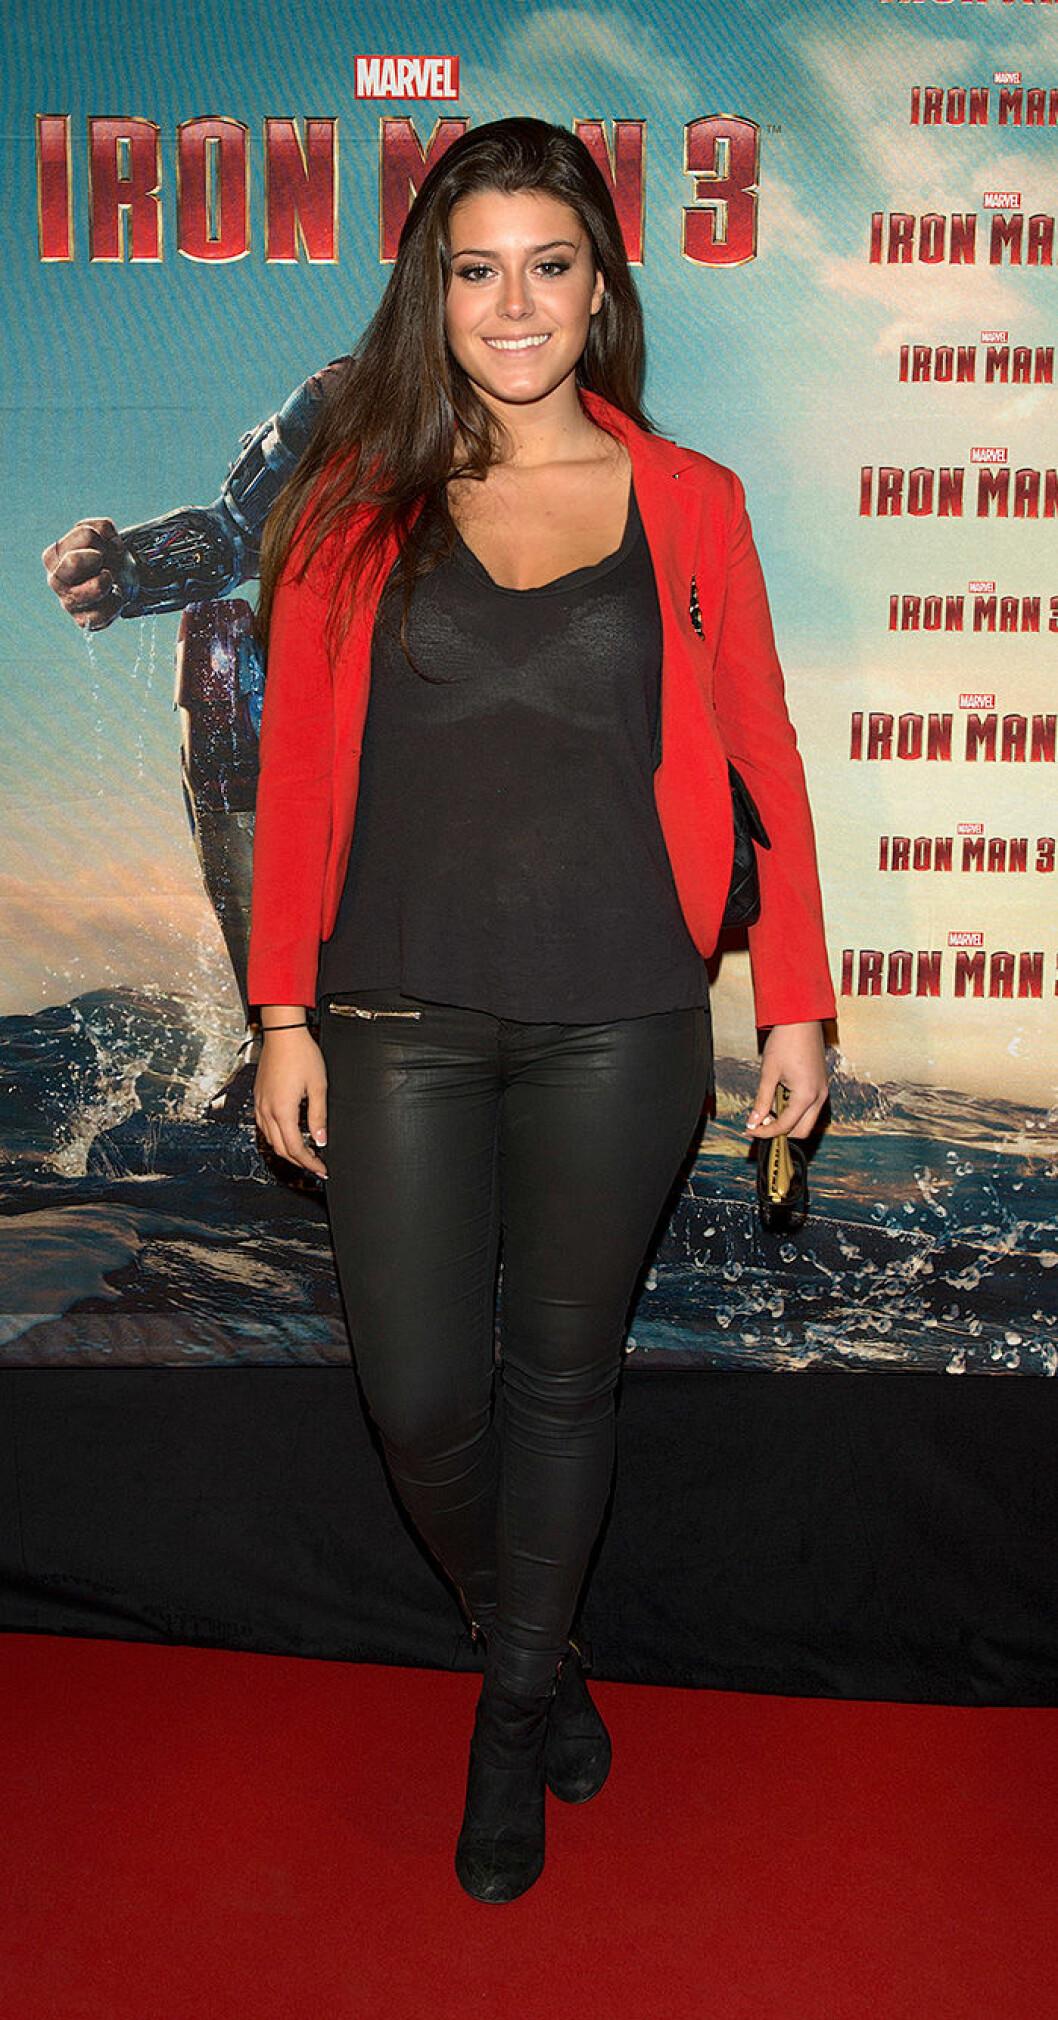 En bild på Bianca Ingrosso på premiären av Iron Man 3 i Stockholm 2013.